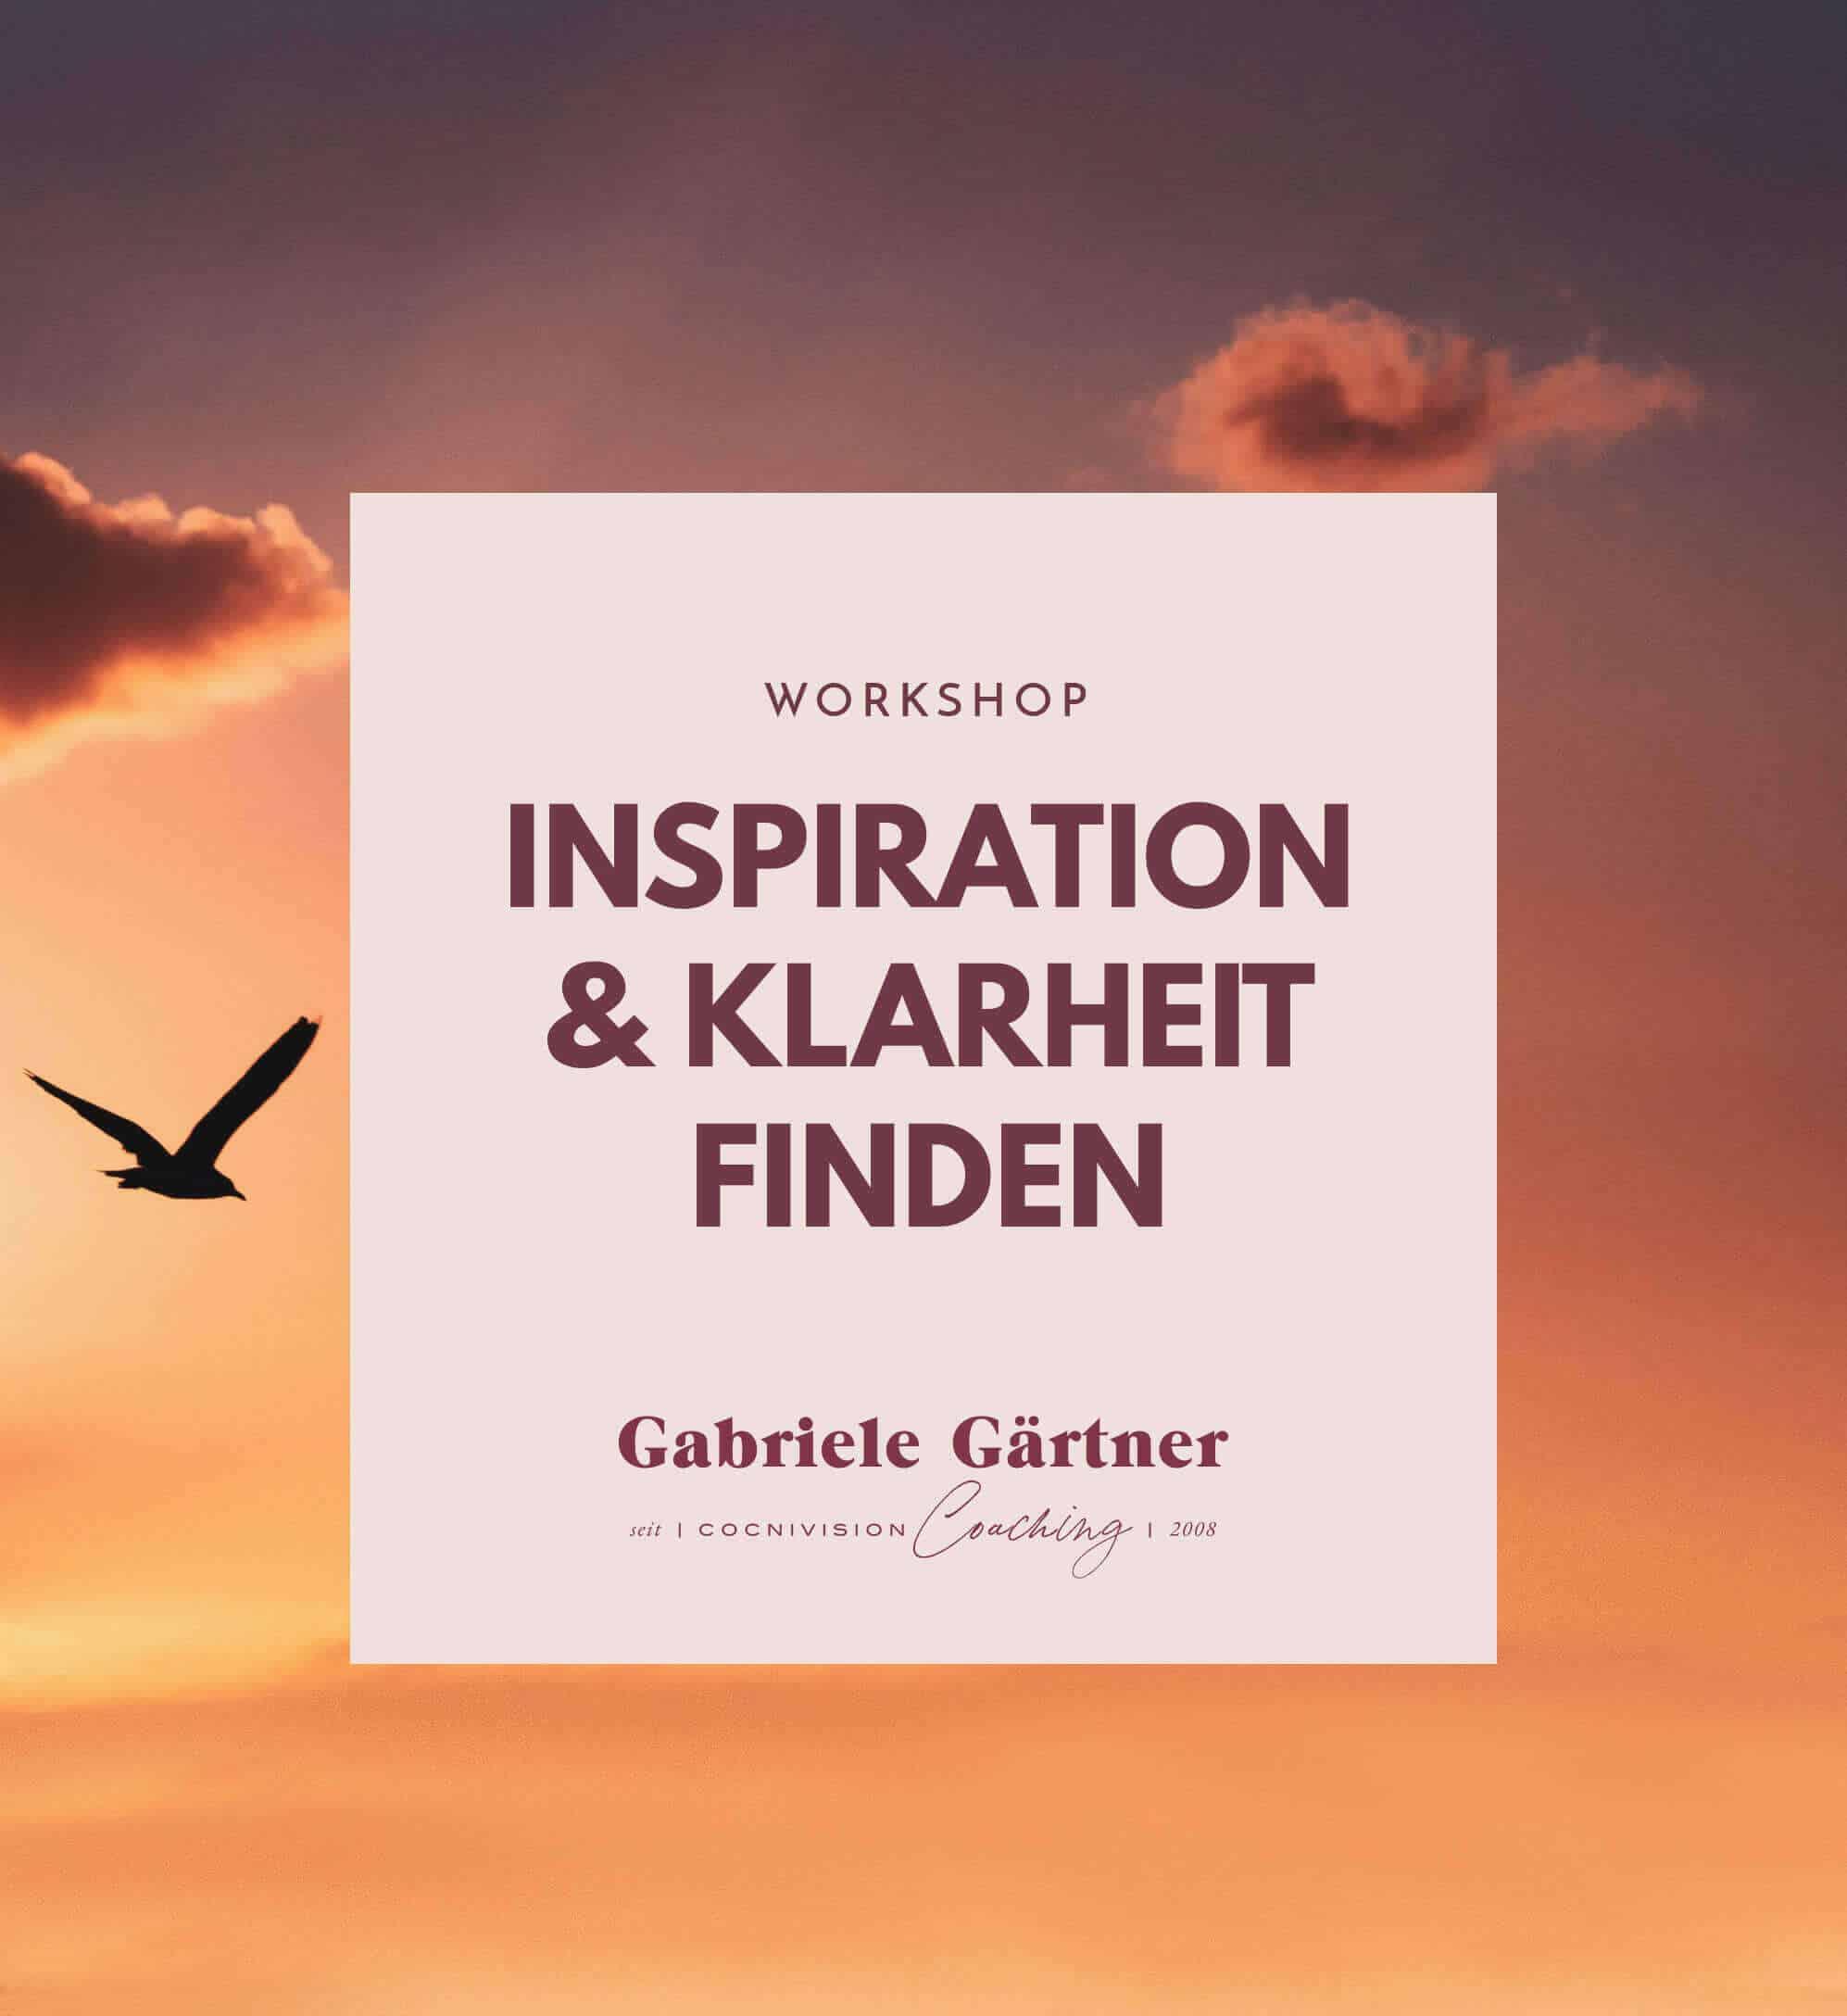 Inspiration-600x550